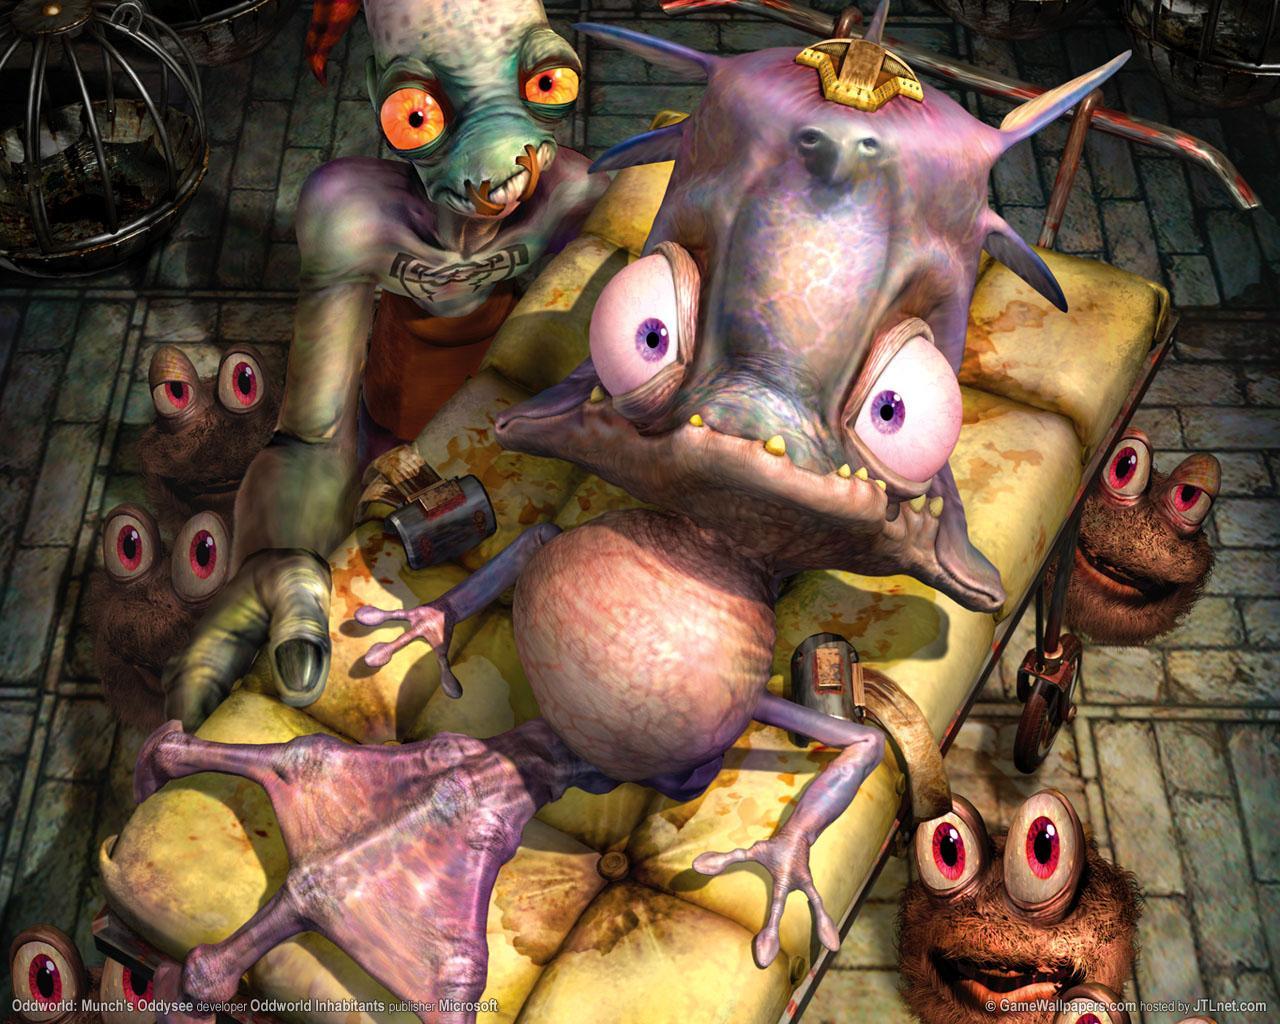 Munch's Oddysee